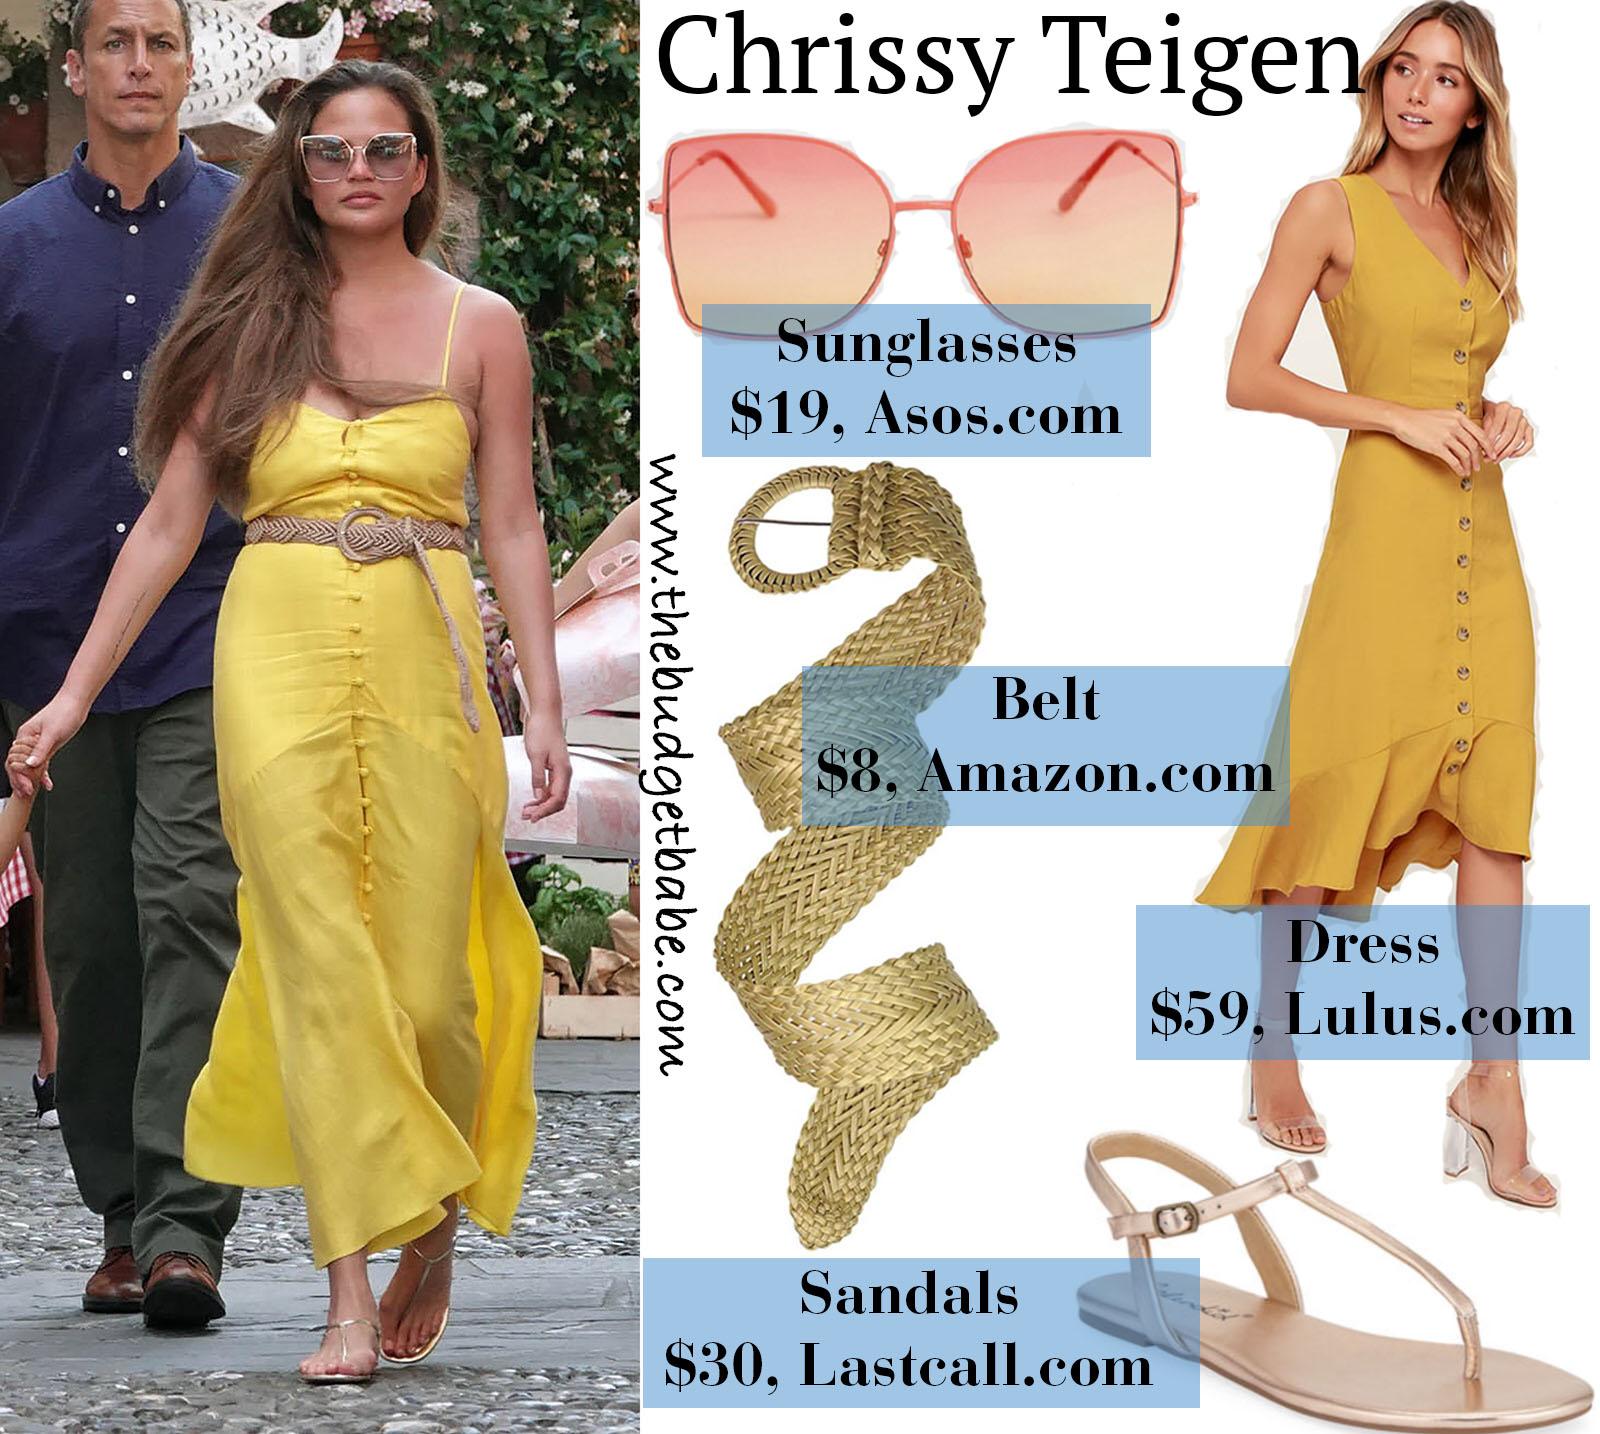 1e311cd3898c7 Chrissy Teigen - The Budget Babe | Affordable Fashion & Style Blog